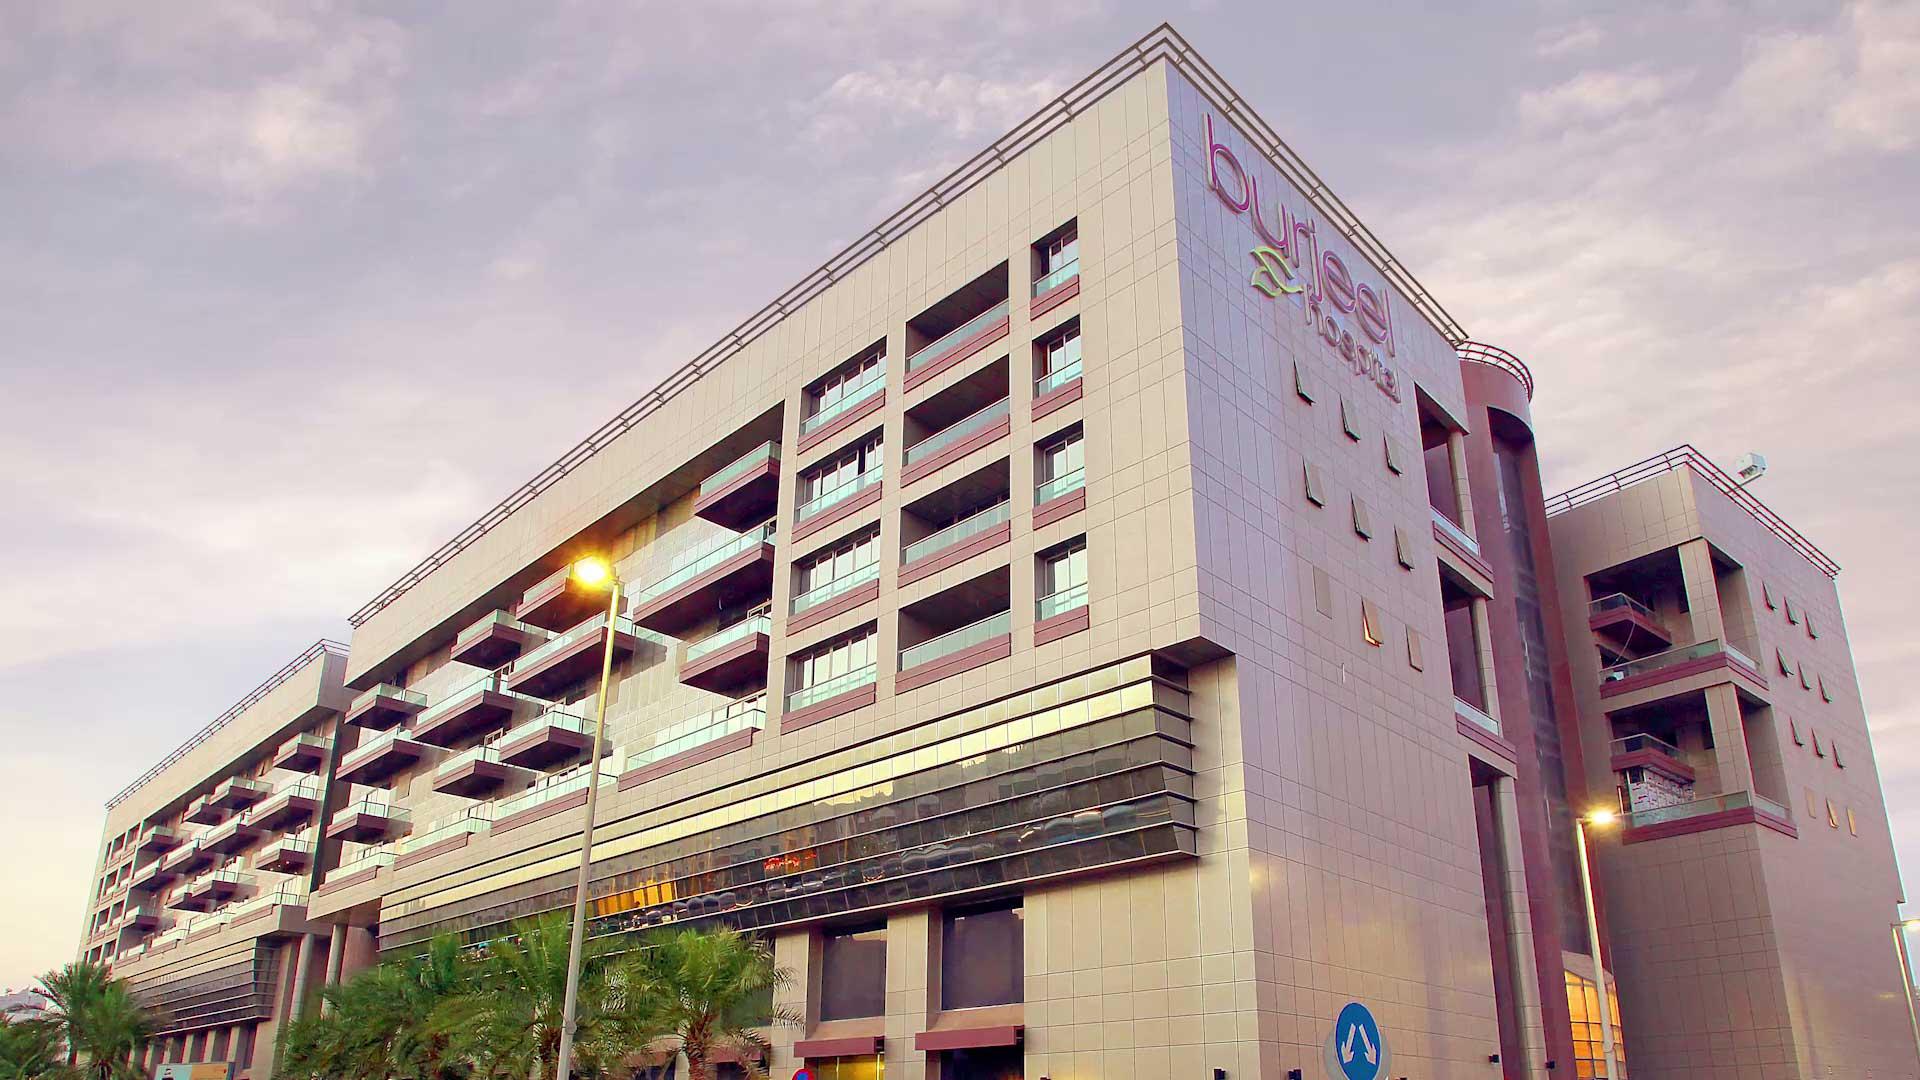 Burjeel Hospital The Art of Healing 2 |